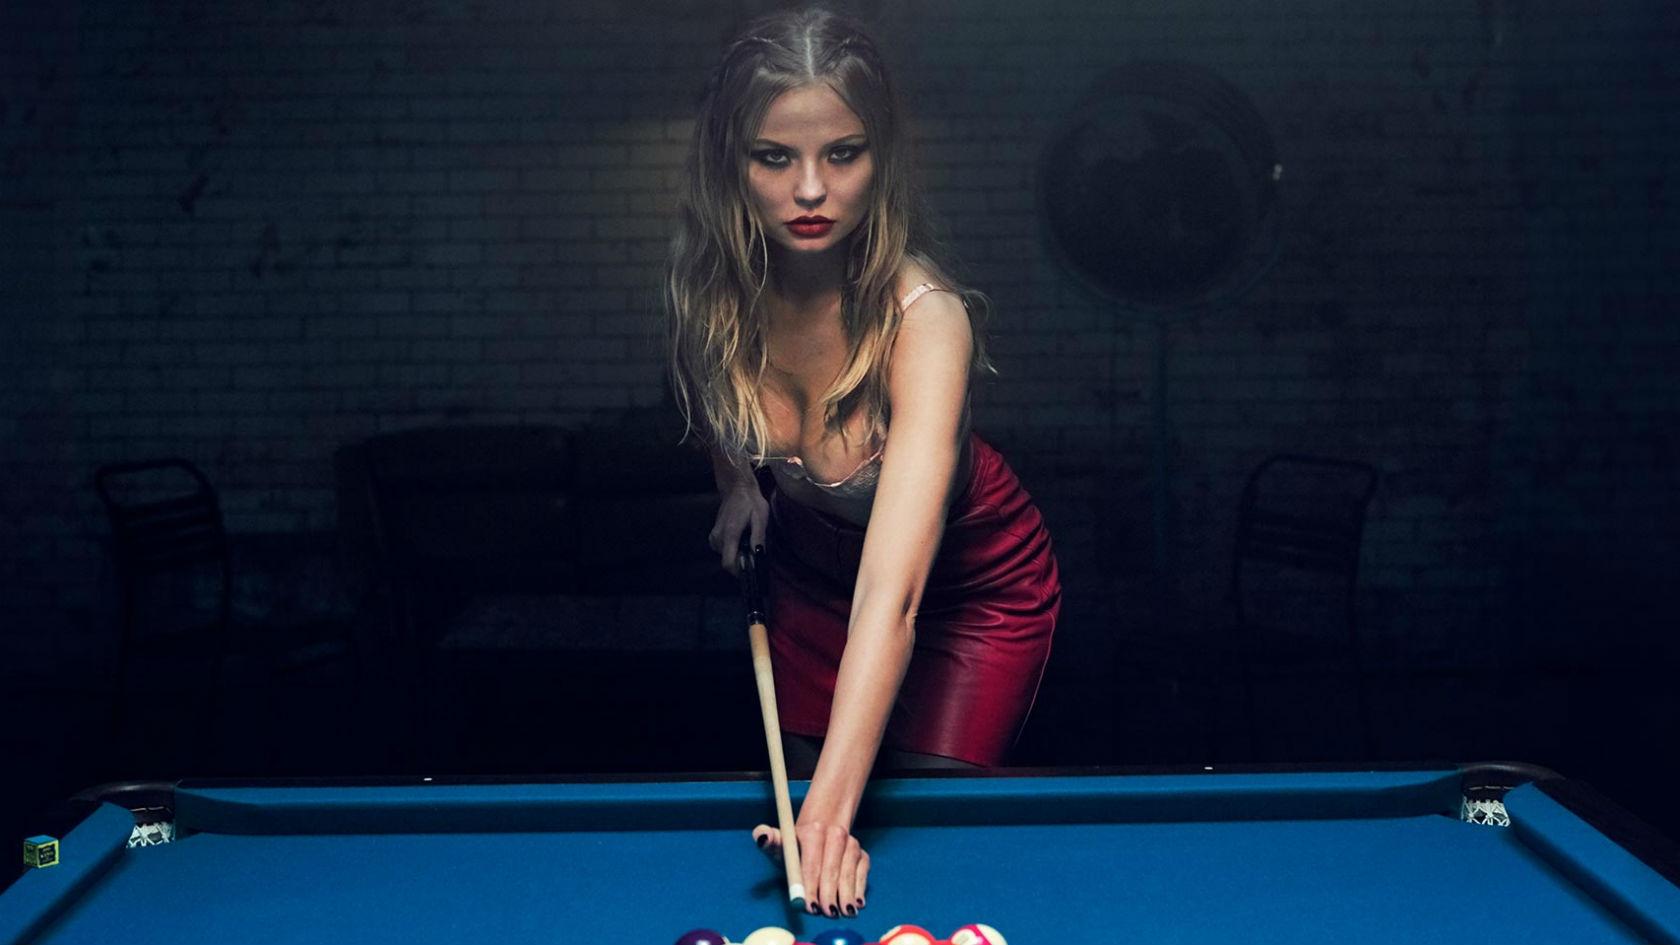 Strip pool video